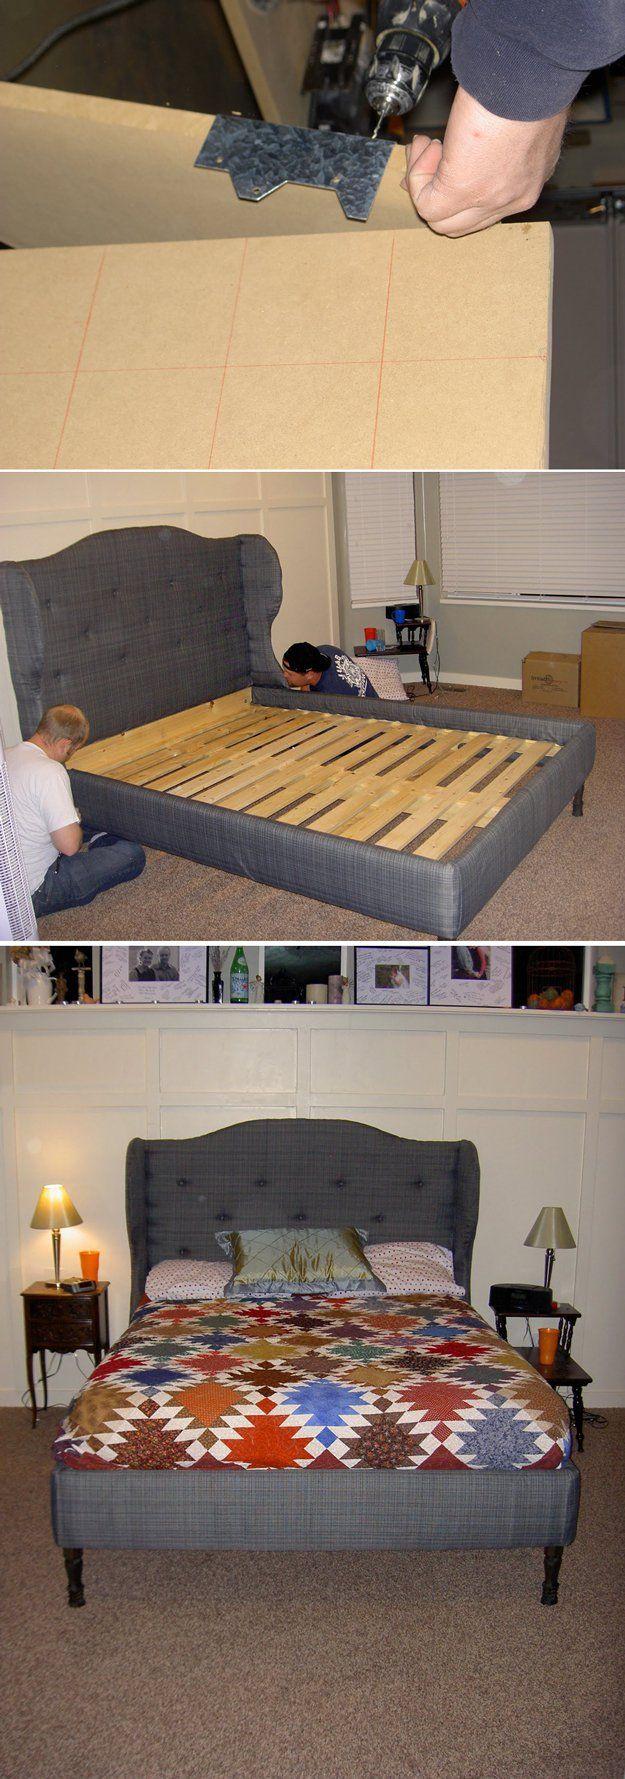 29 best diy headboards images on pinterest bed headboards bedroom